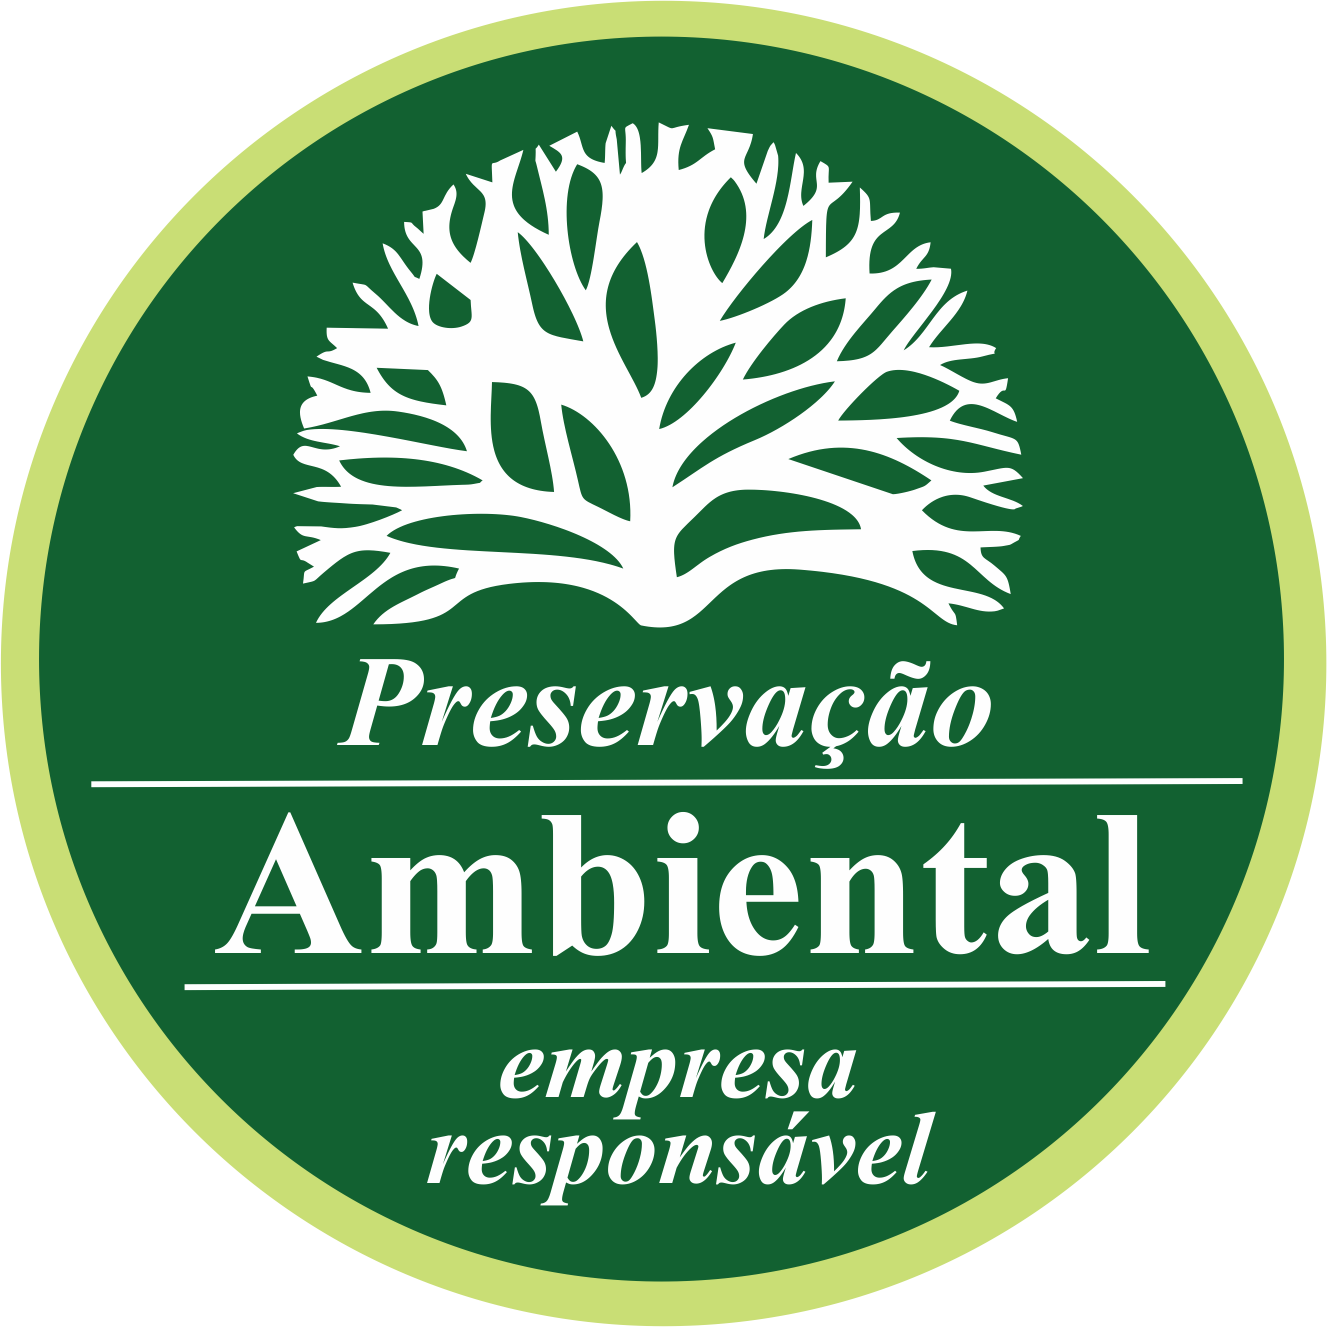 Perfume Aromatizante 500ml - Açaí (Go Eco Wash)  - Loja Go Eco Wash